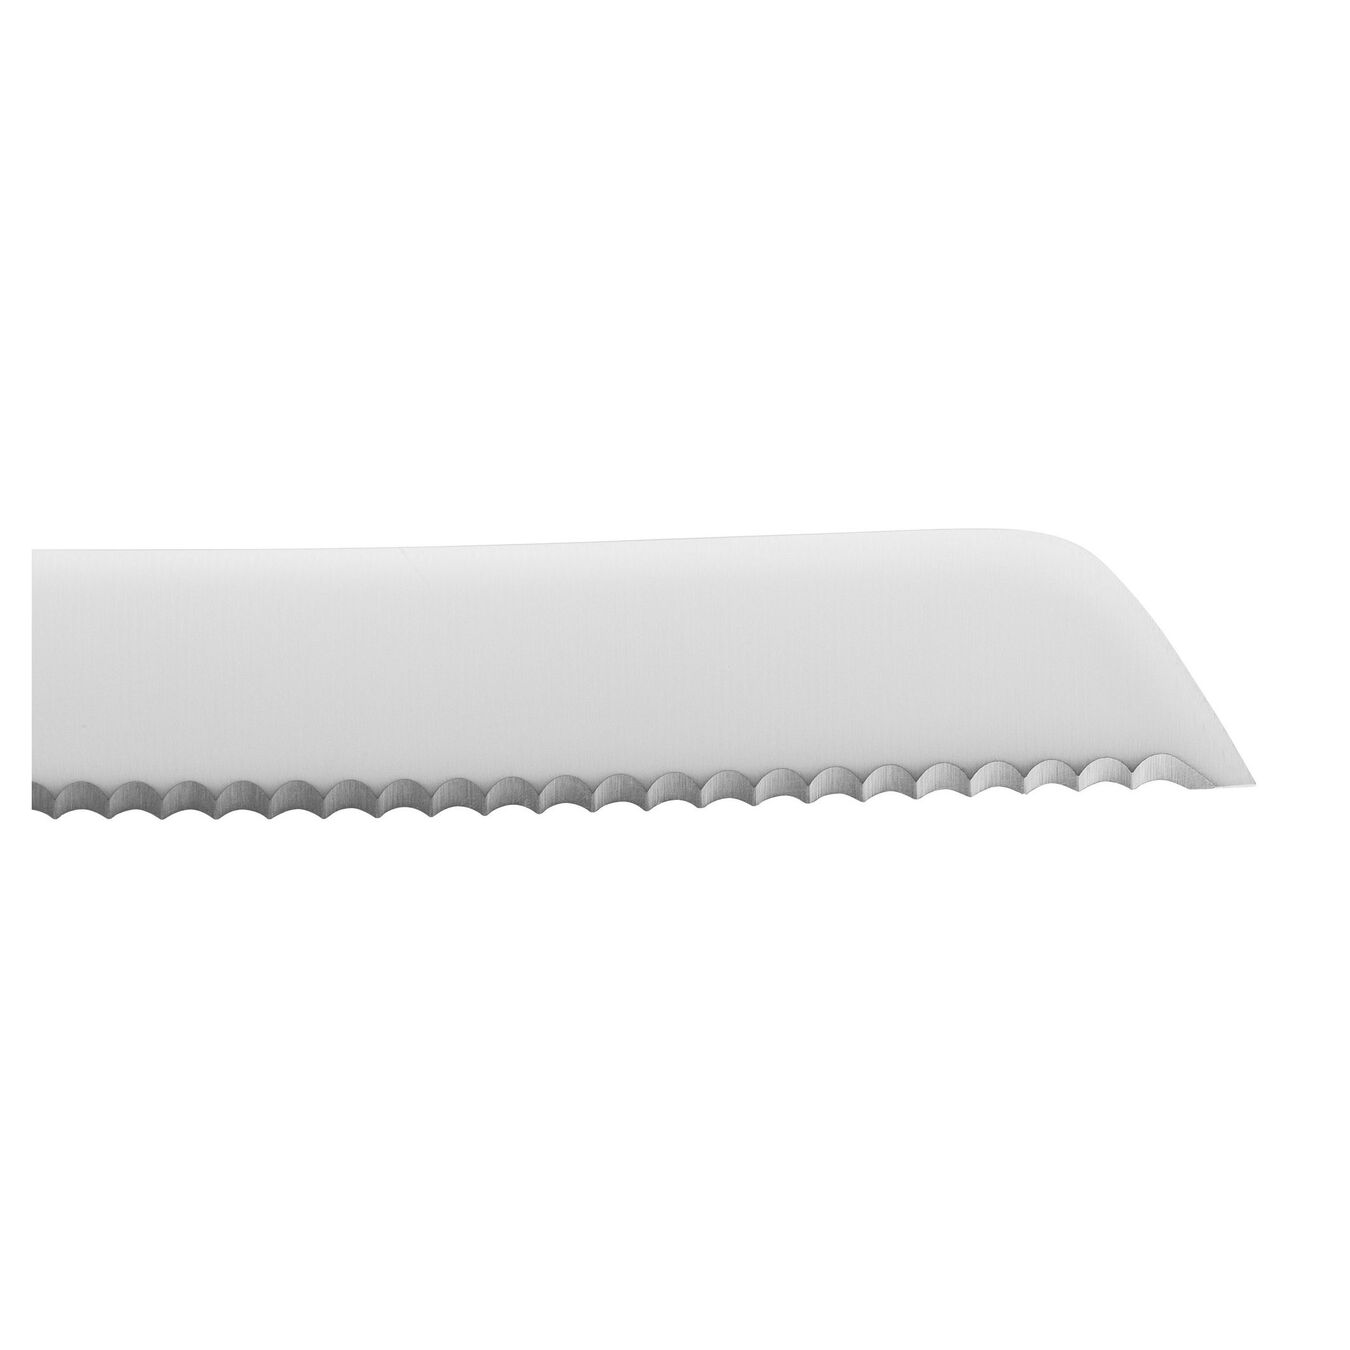 Brotmesser 20 cm,,large 2